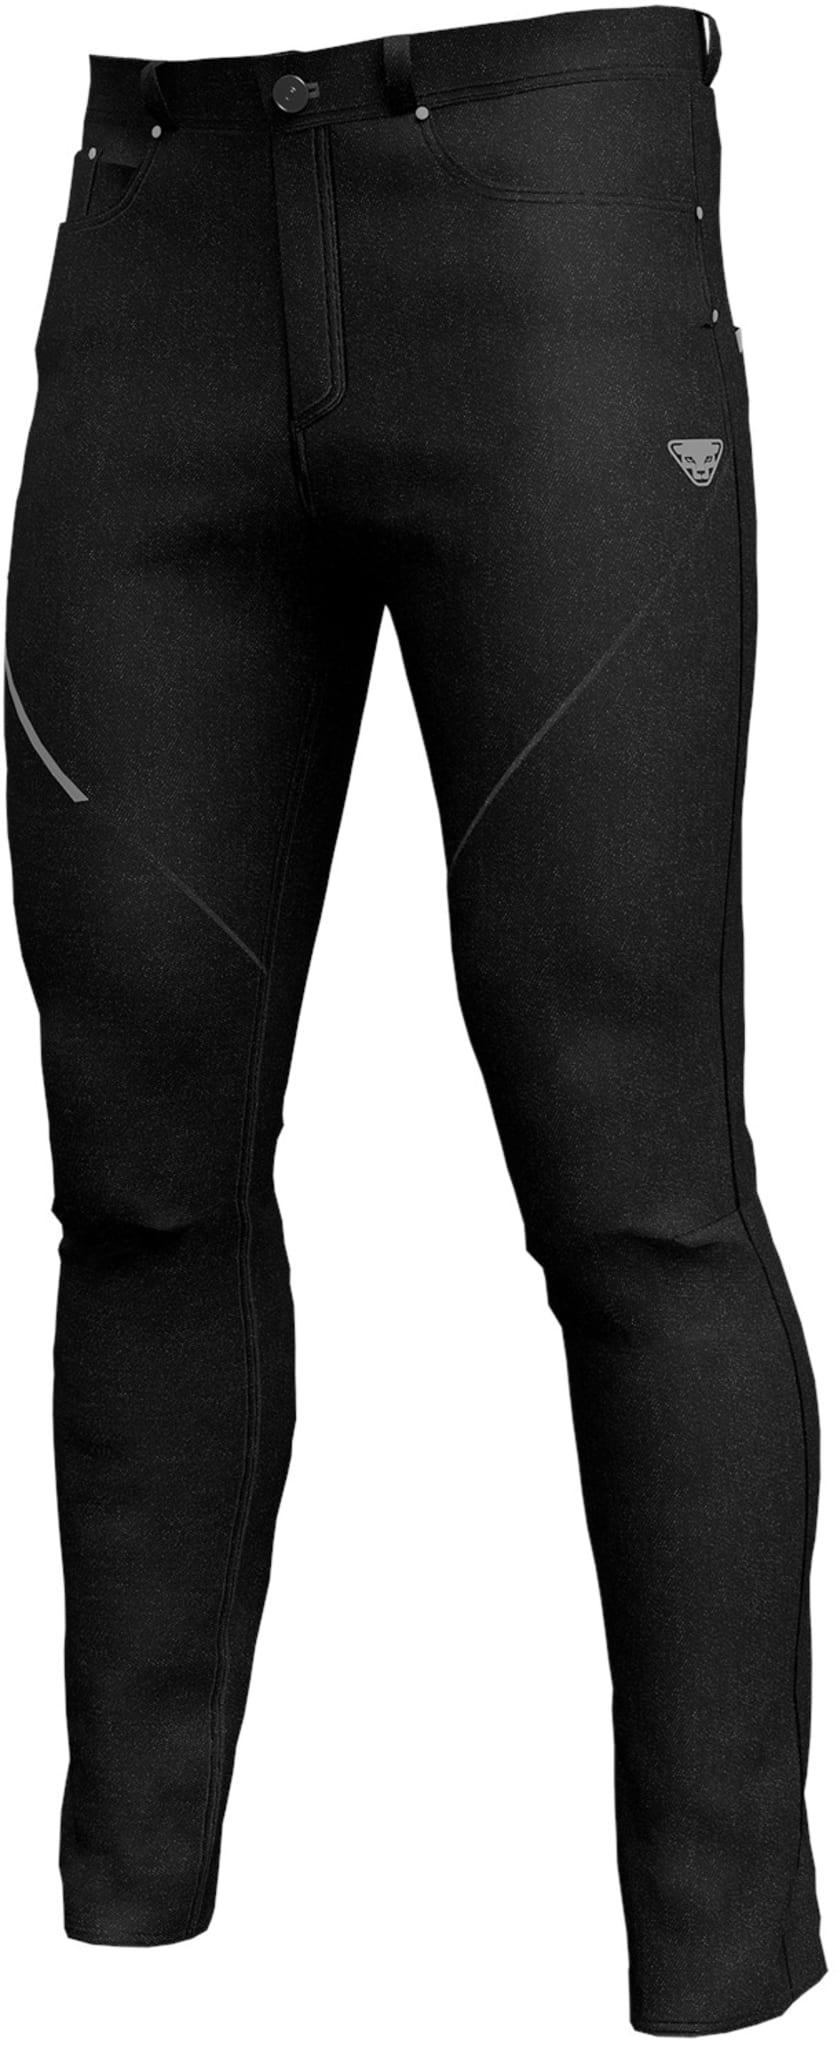 Lette softshellbukser med jeans-utforming